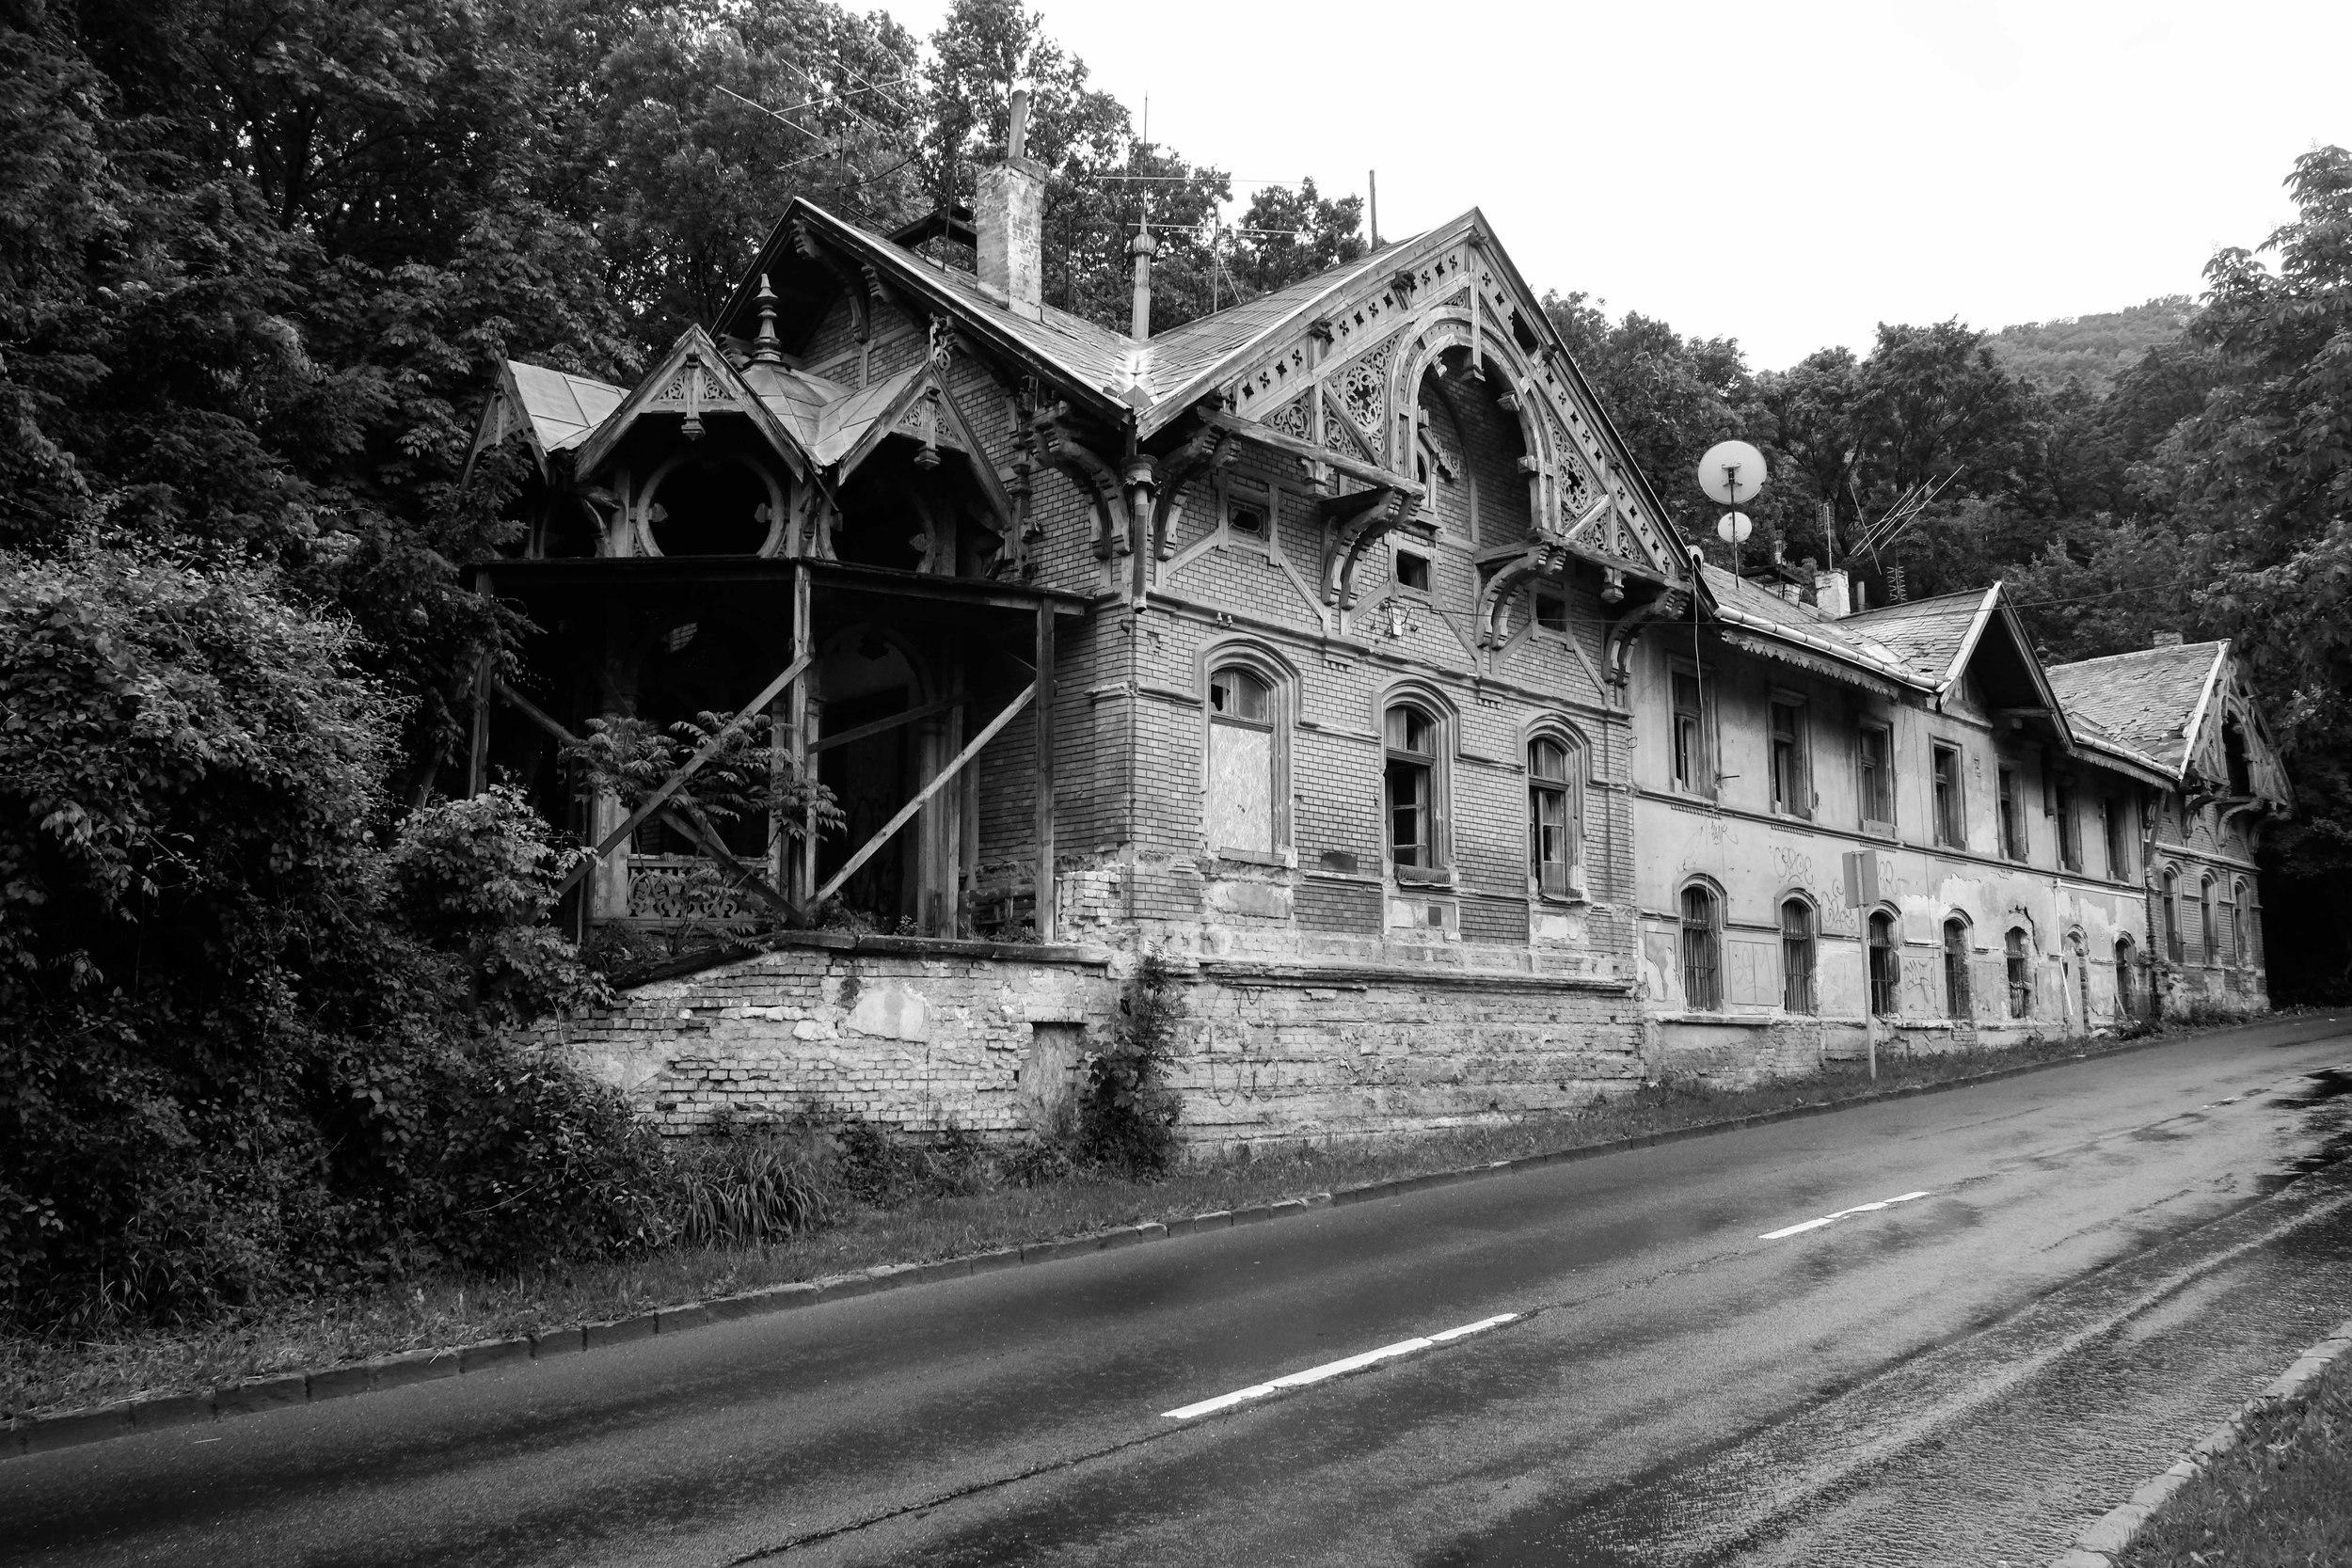 Neglected railway station, Buda